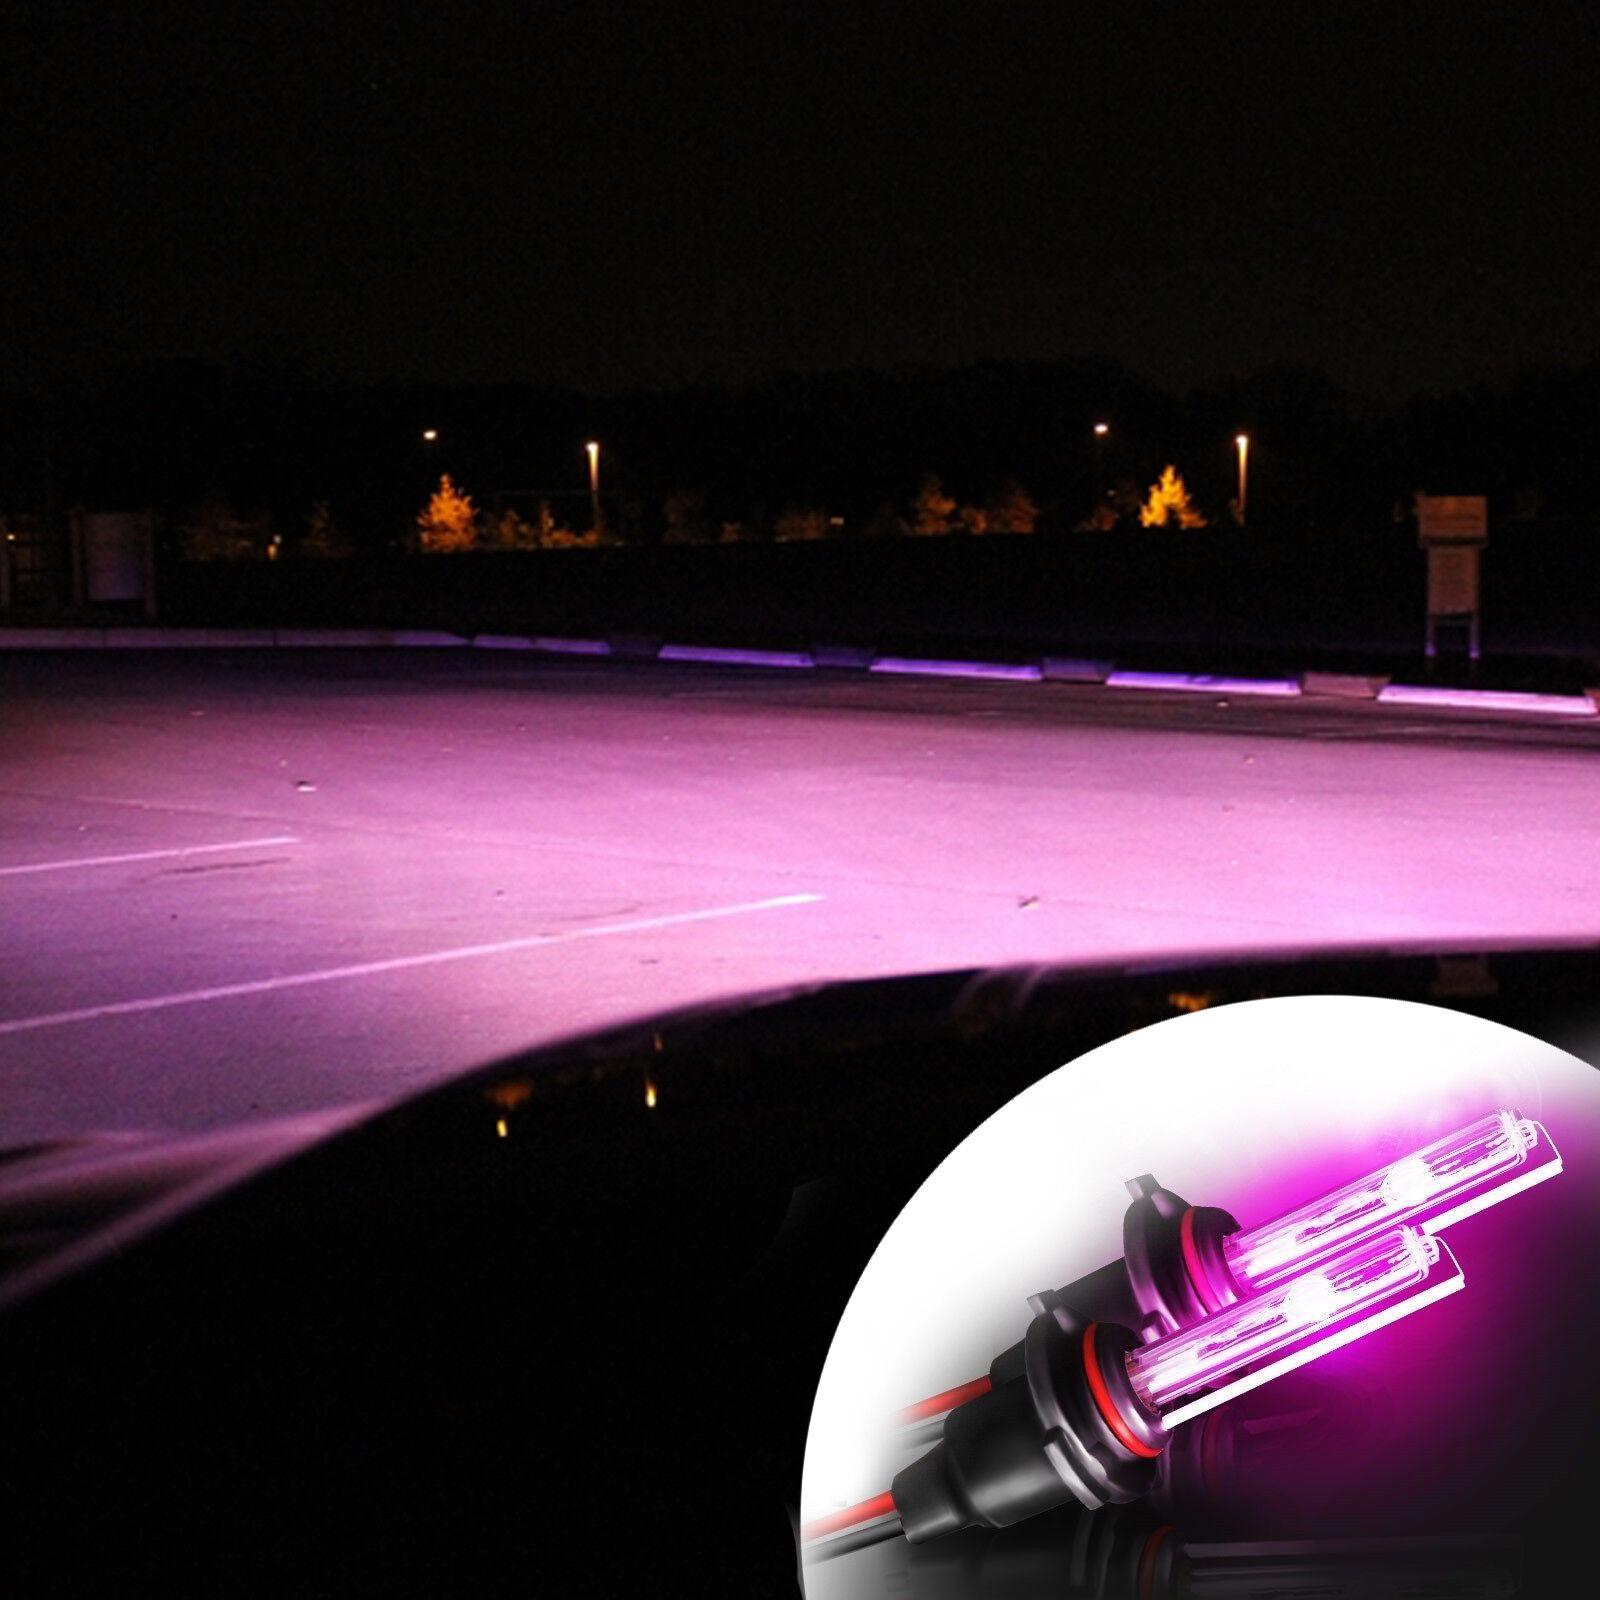 Xentec Xenon Light HID LED Headlight Kit H4 H16 H8 H10 H3 9007 Hb3 H9 899 881